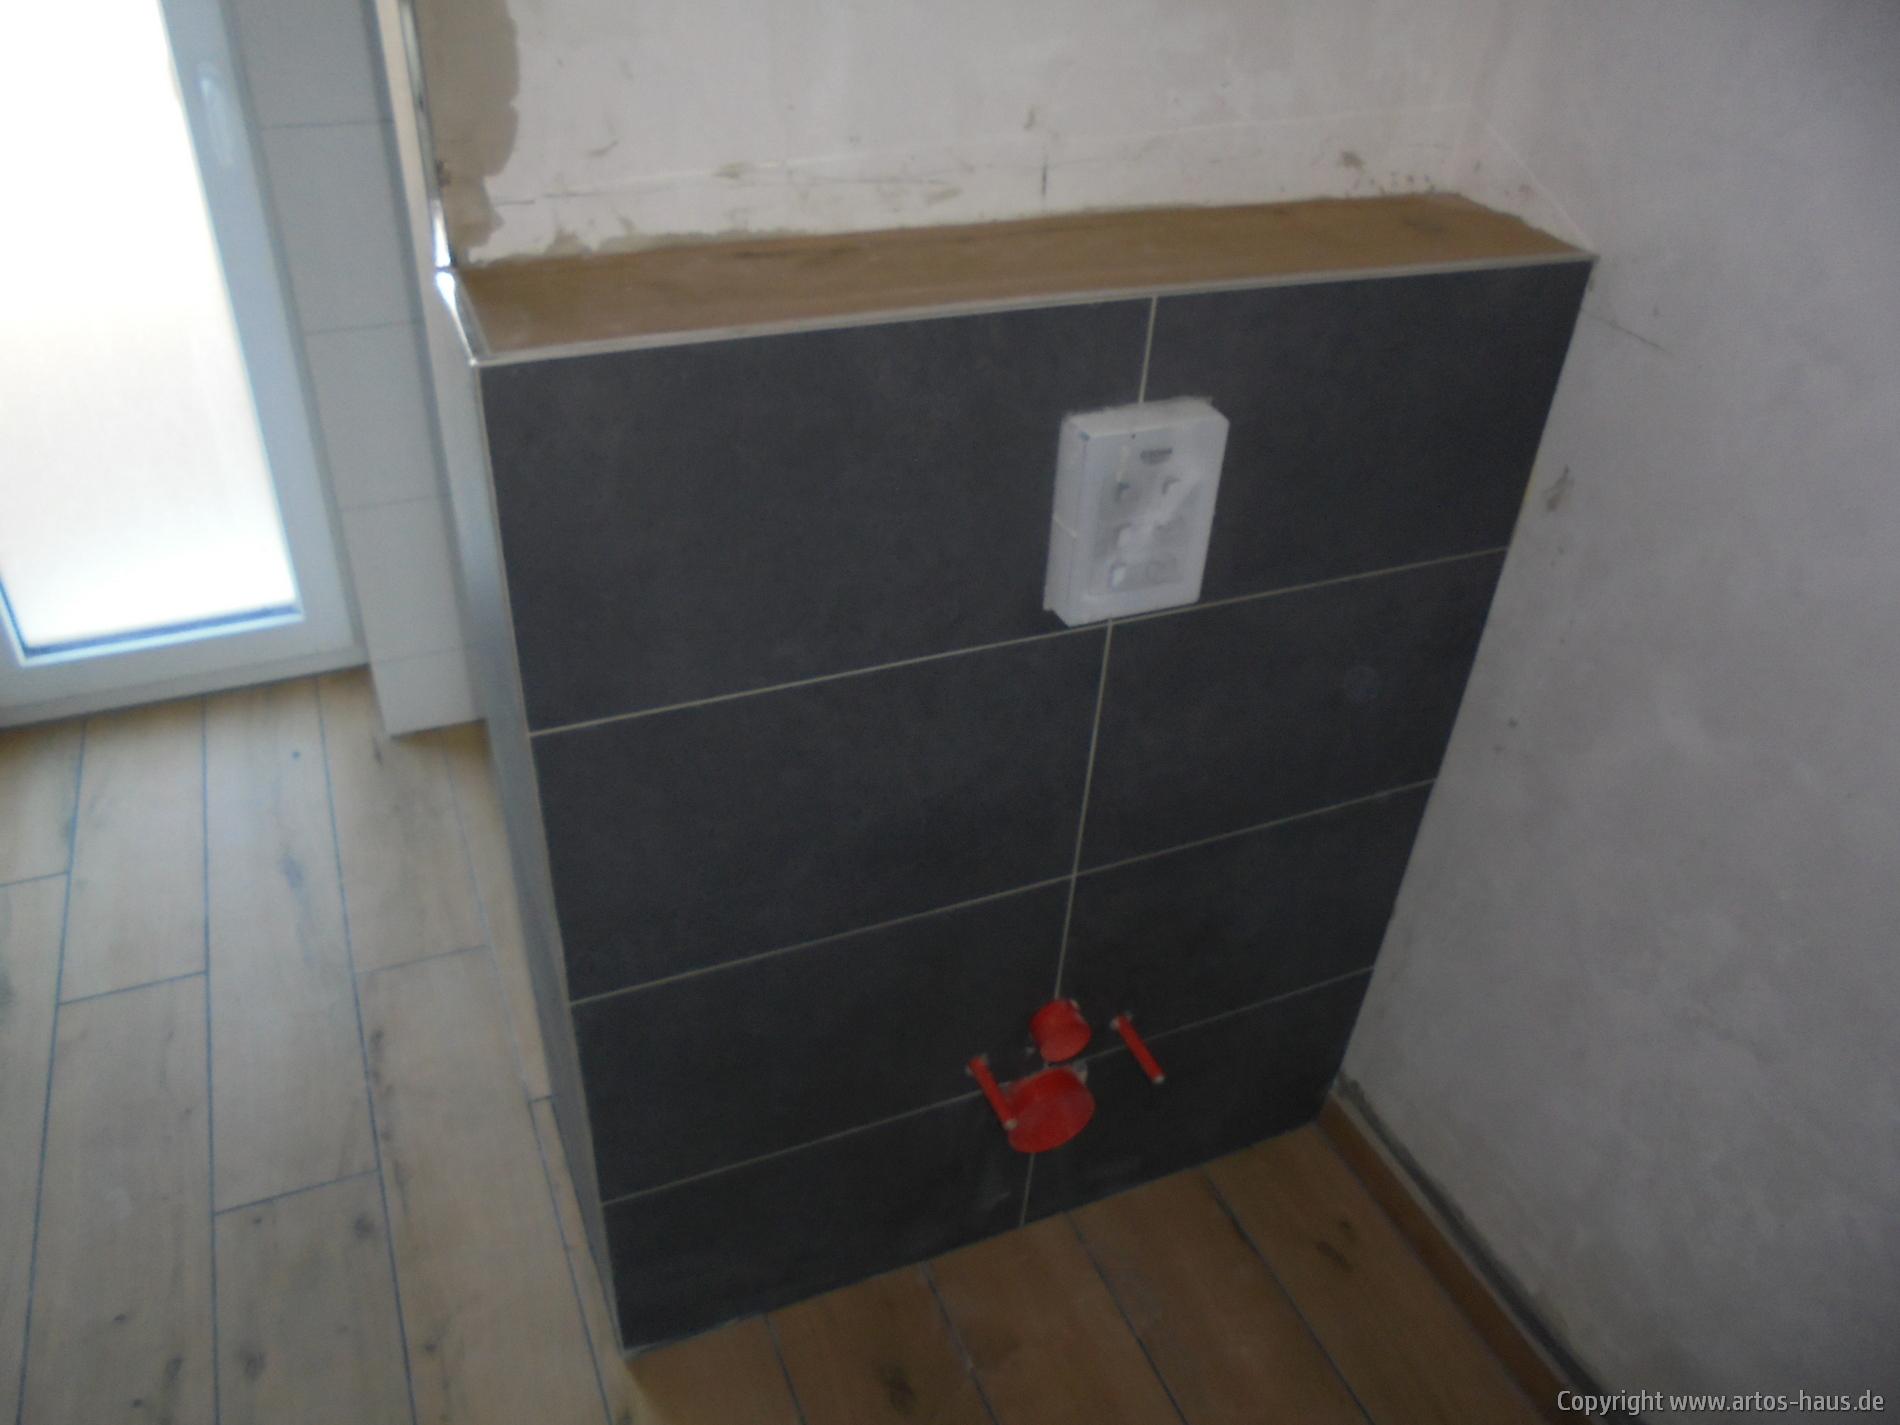 Fliesenarbeiten | Bauvorhaben www.artos-haus.de | Bild 7